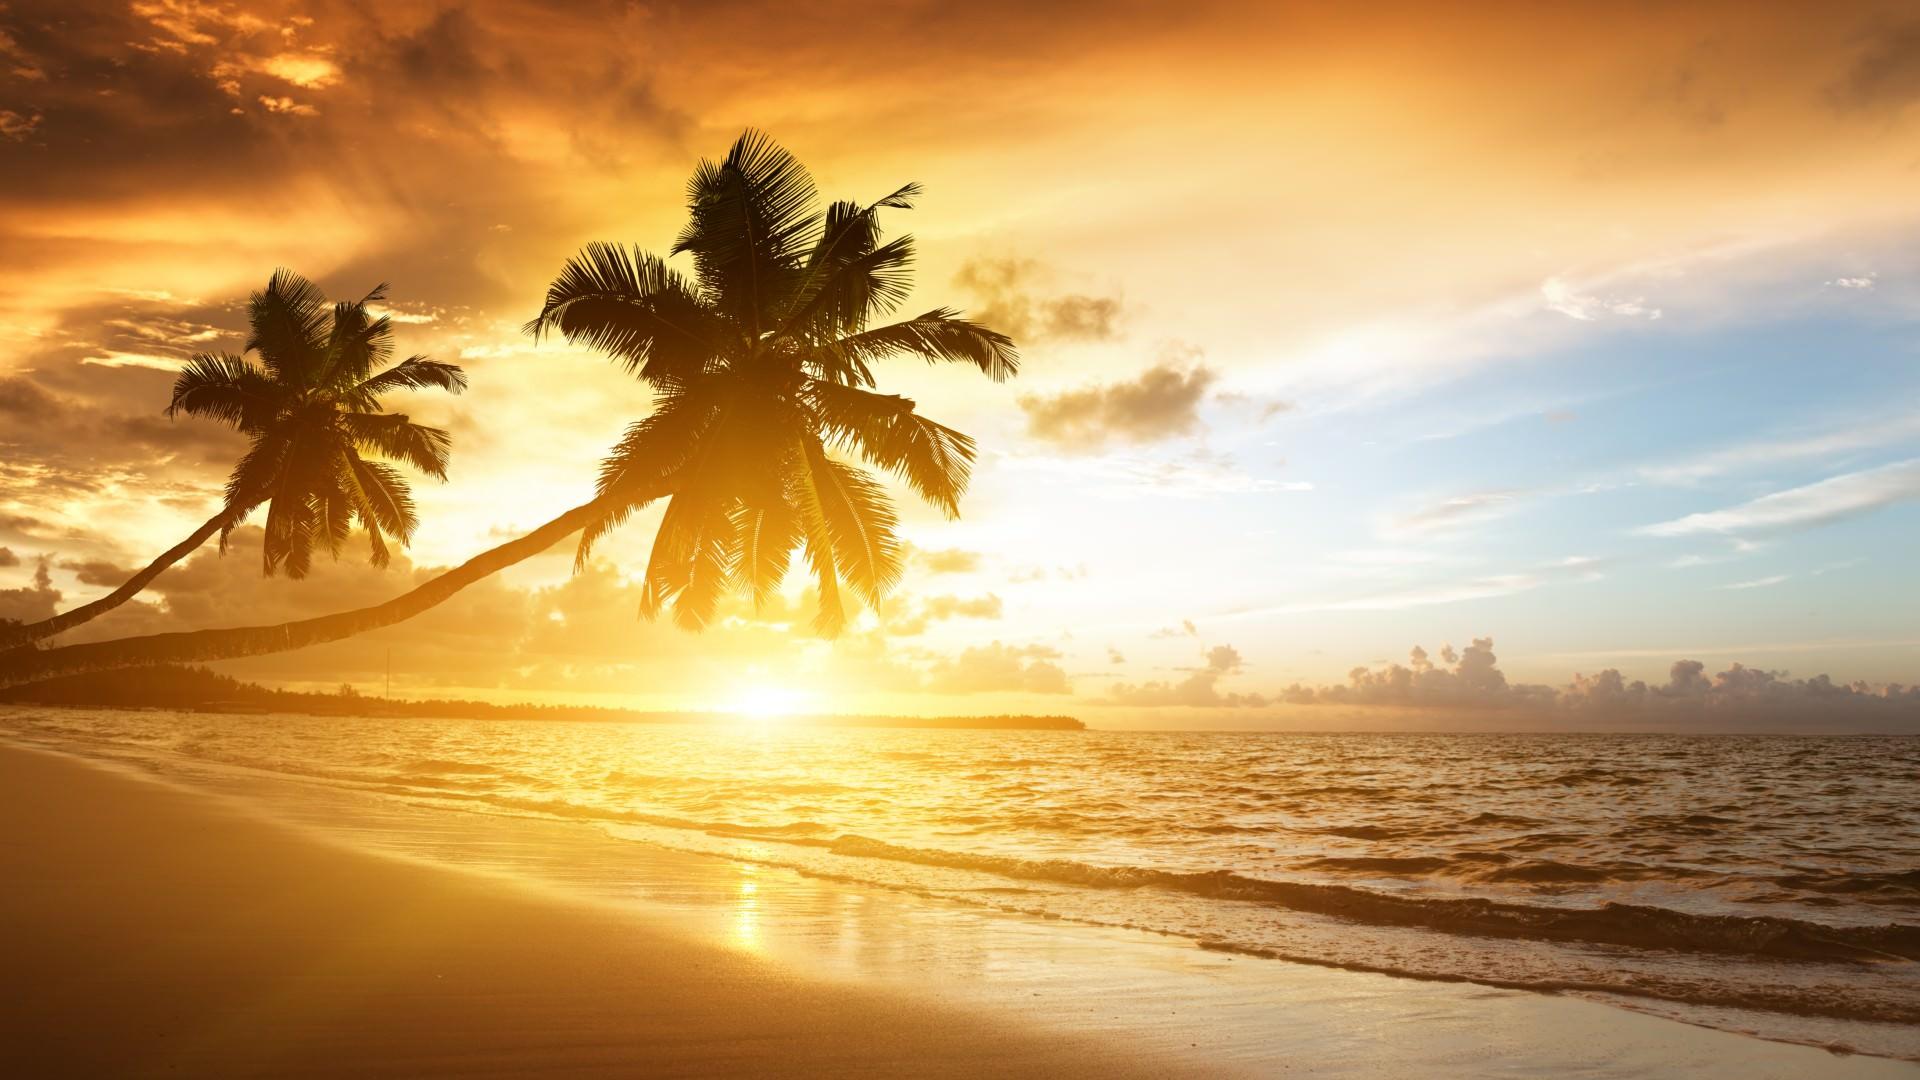 Astonishing Sunrise in Beach Wallpaper